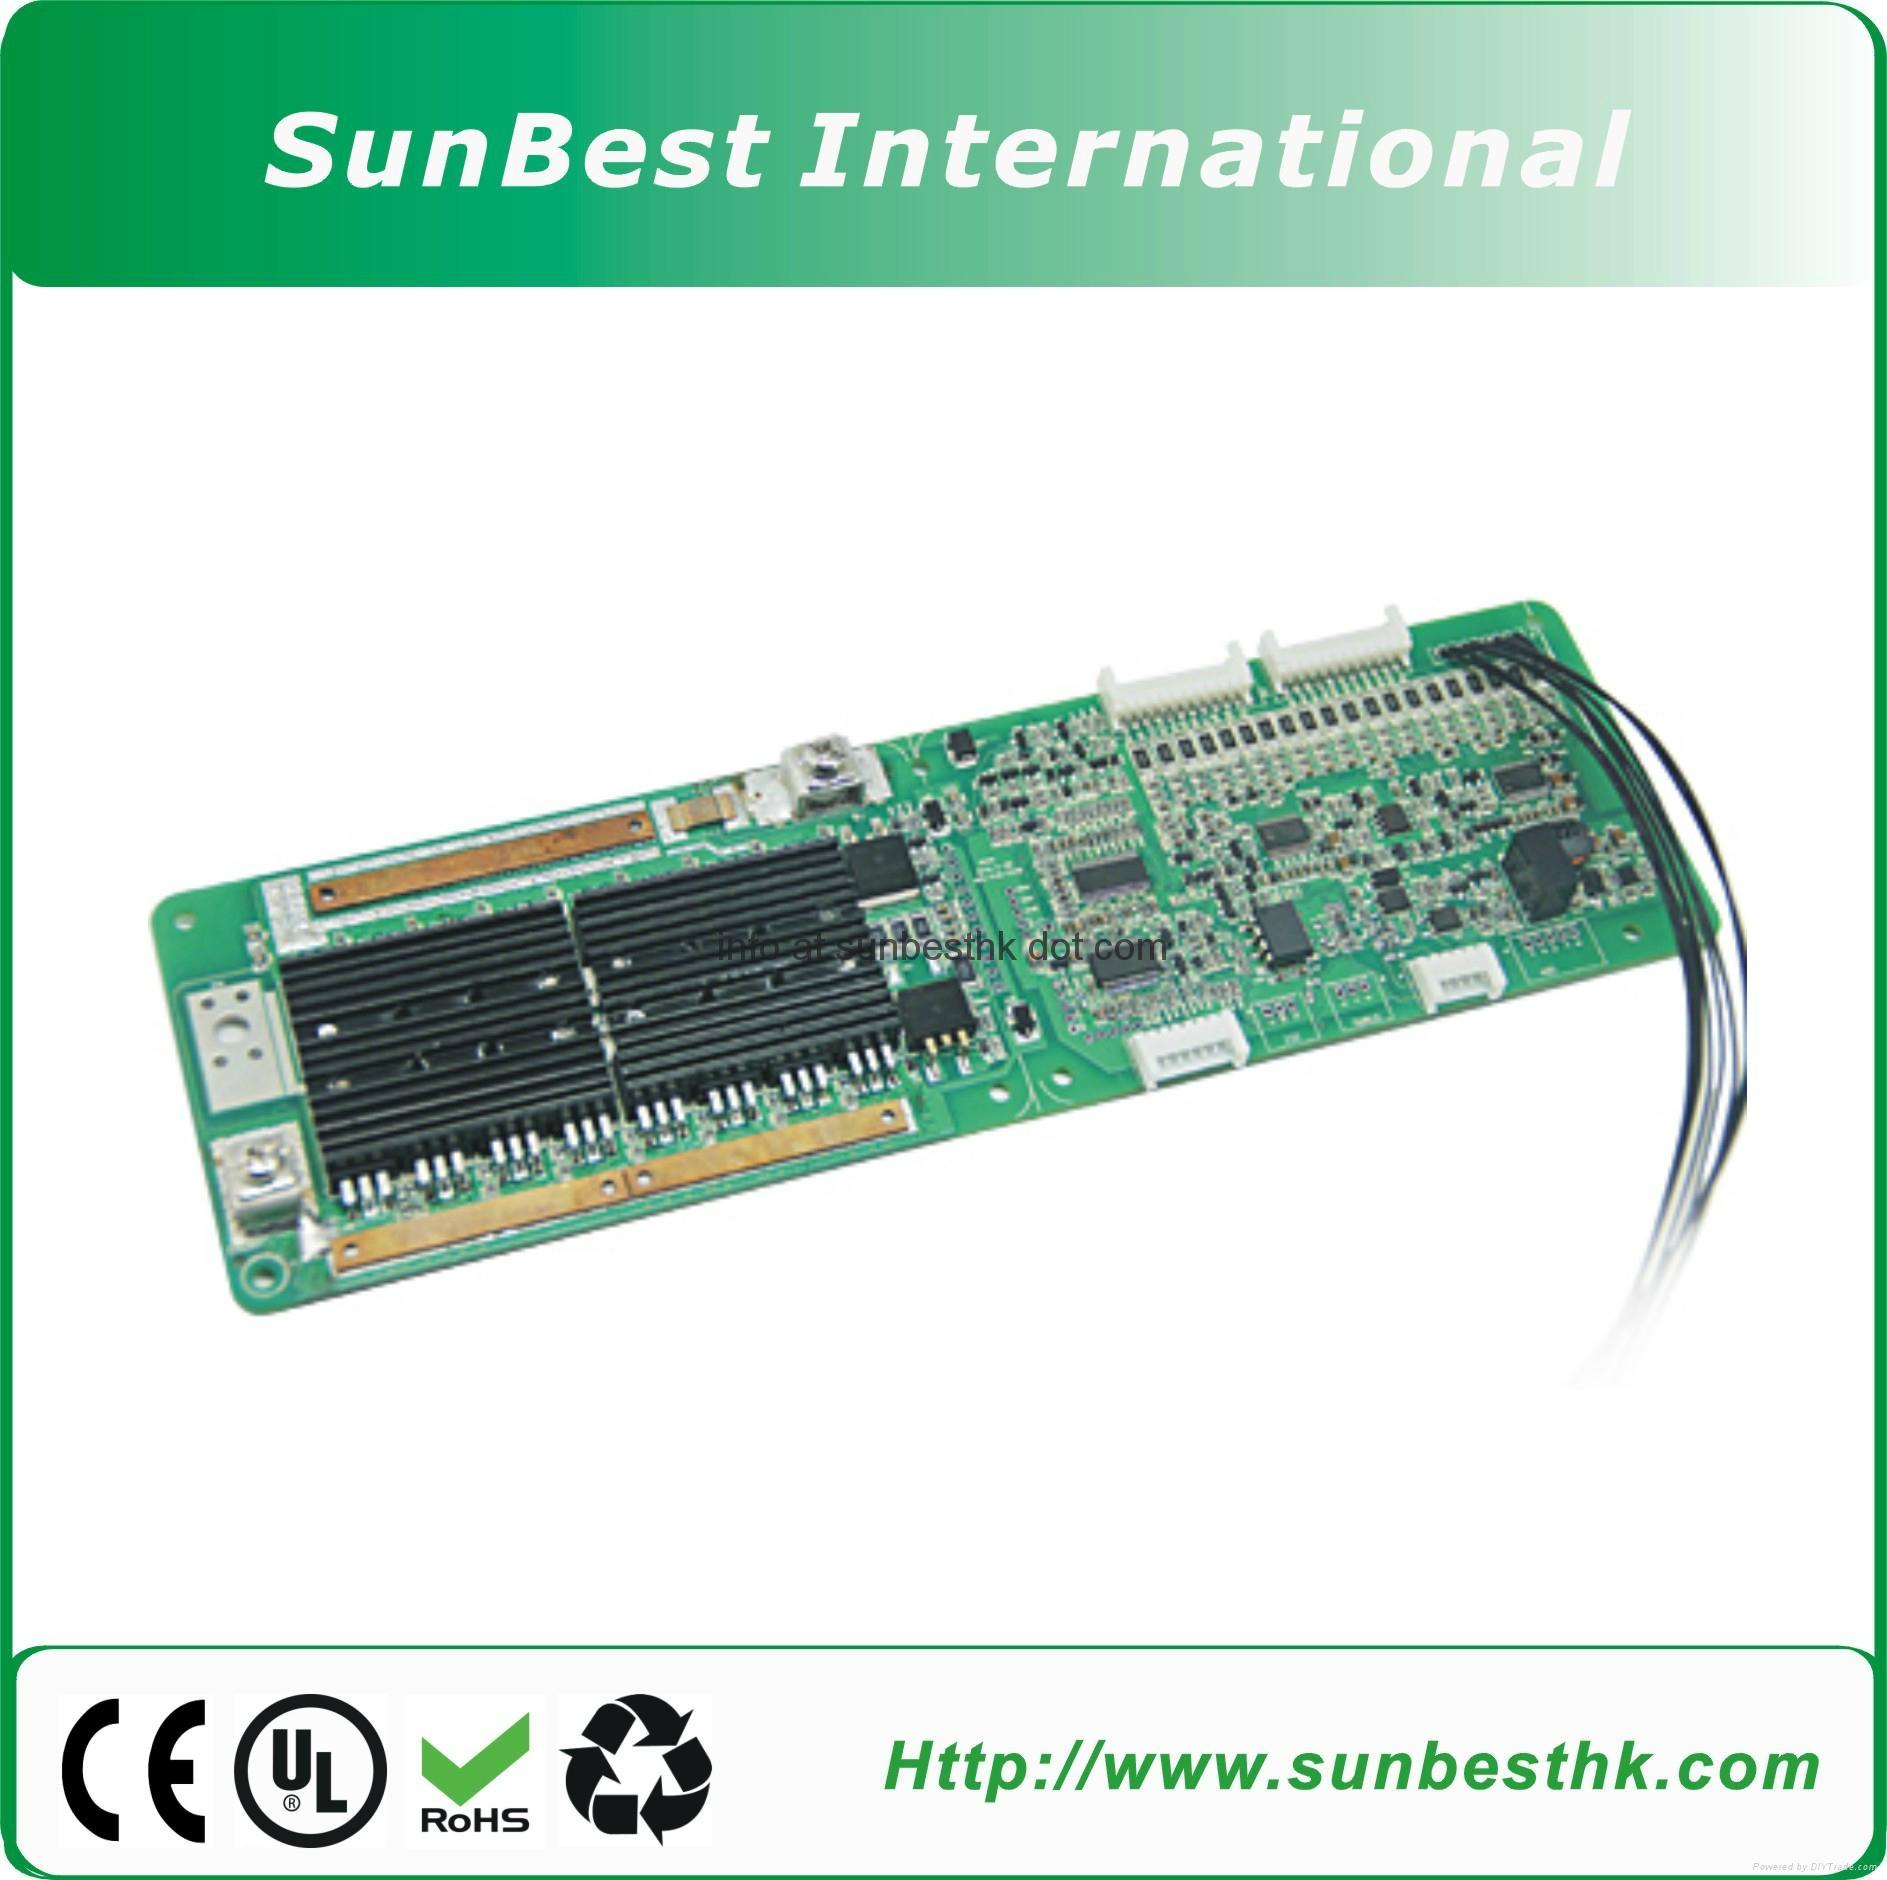 Battery Management System (BMS) 48.1V 13S Li-ion and Li-Polymer Battery